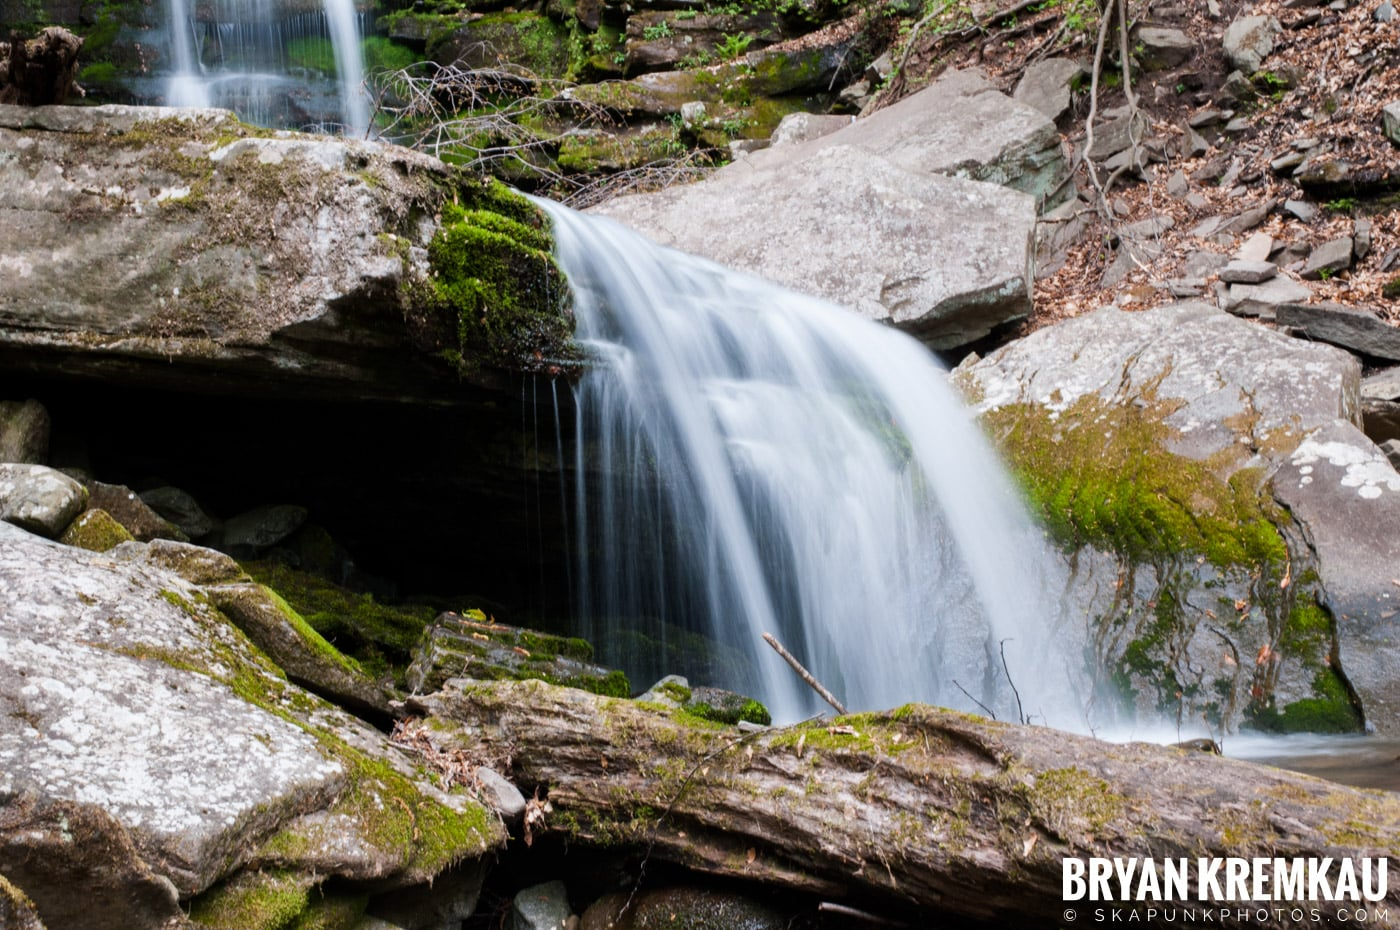 Getting Engaged @ Peekamoose Waterfall, Sundown NY - 5.1.10 (21)